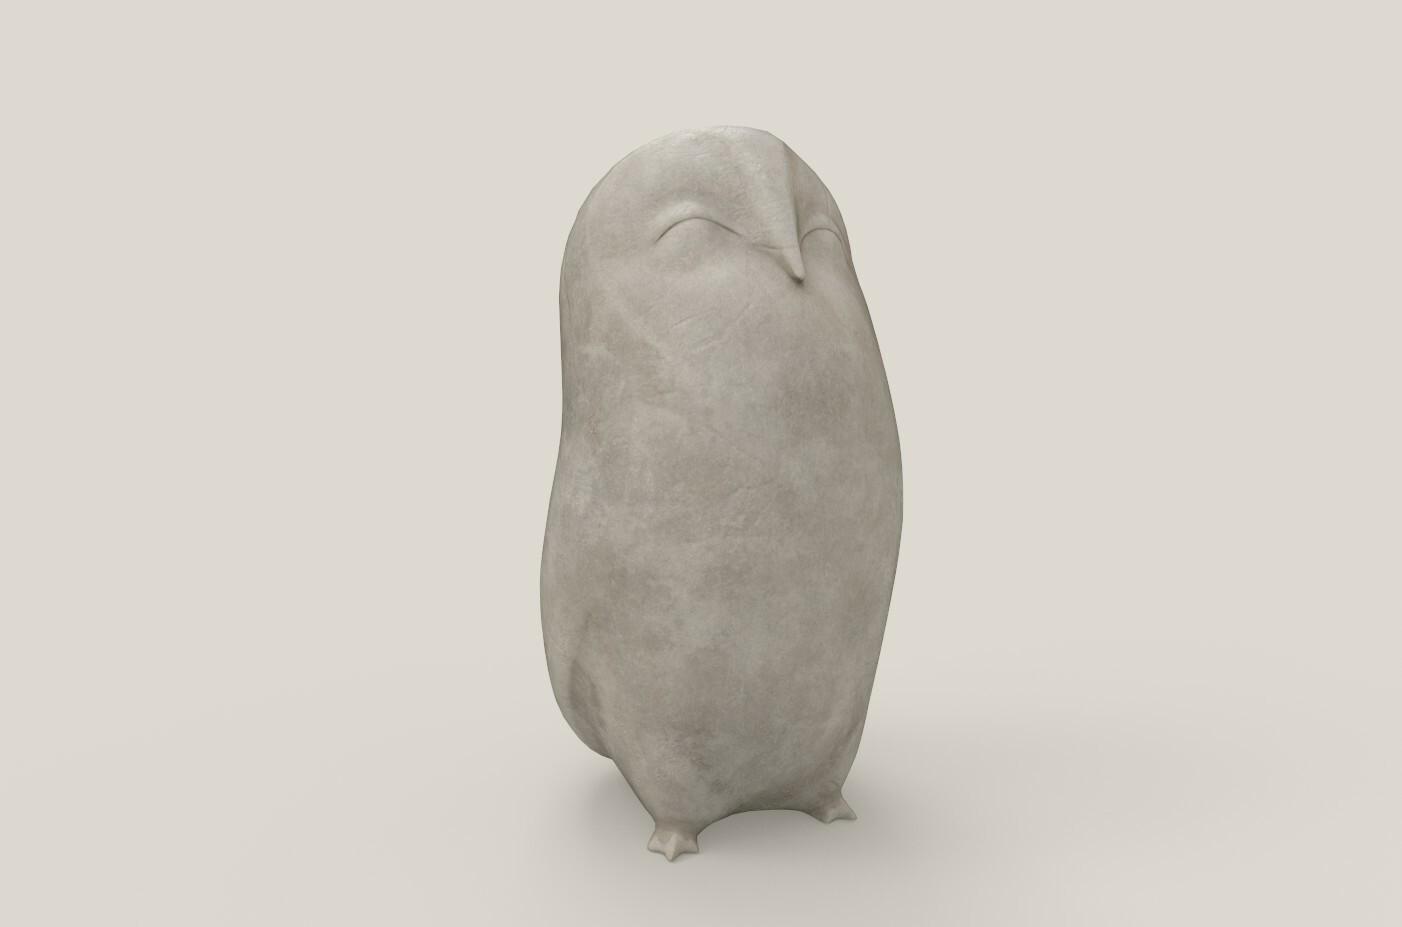 Owl Figurine Archimedes Render